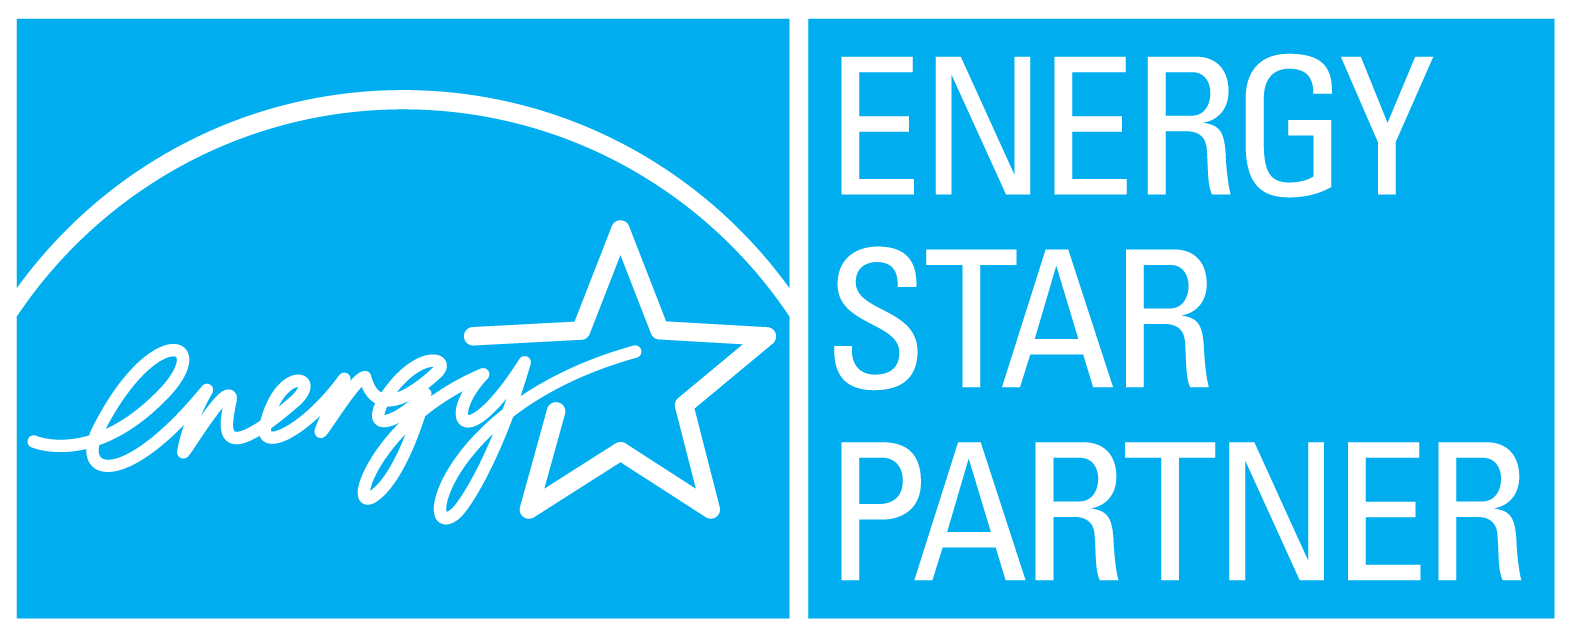 Energy Star Parner